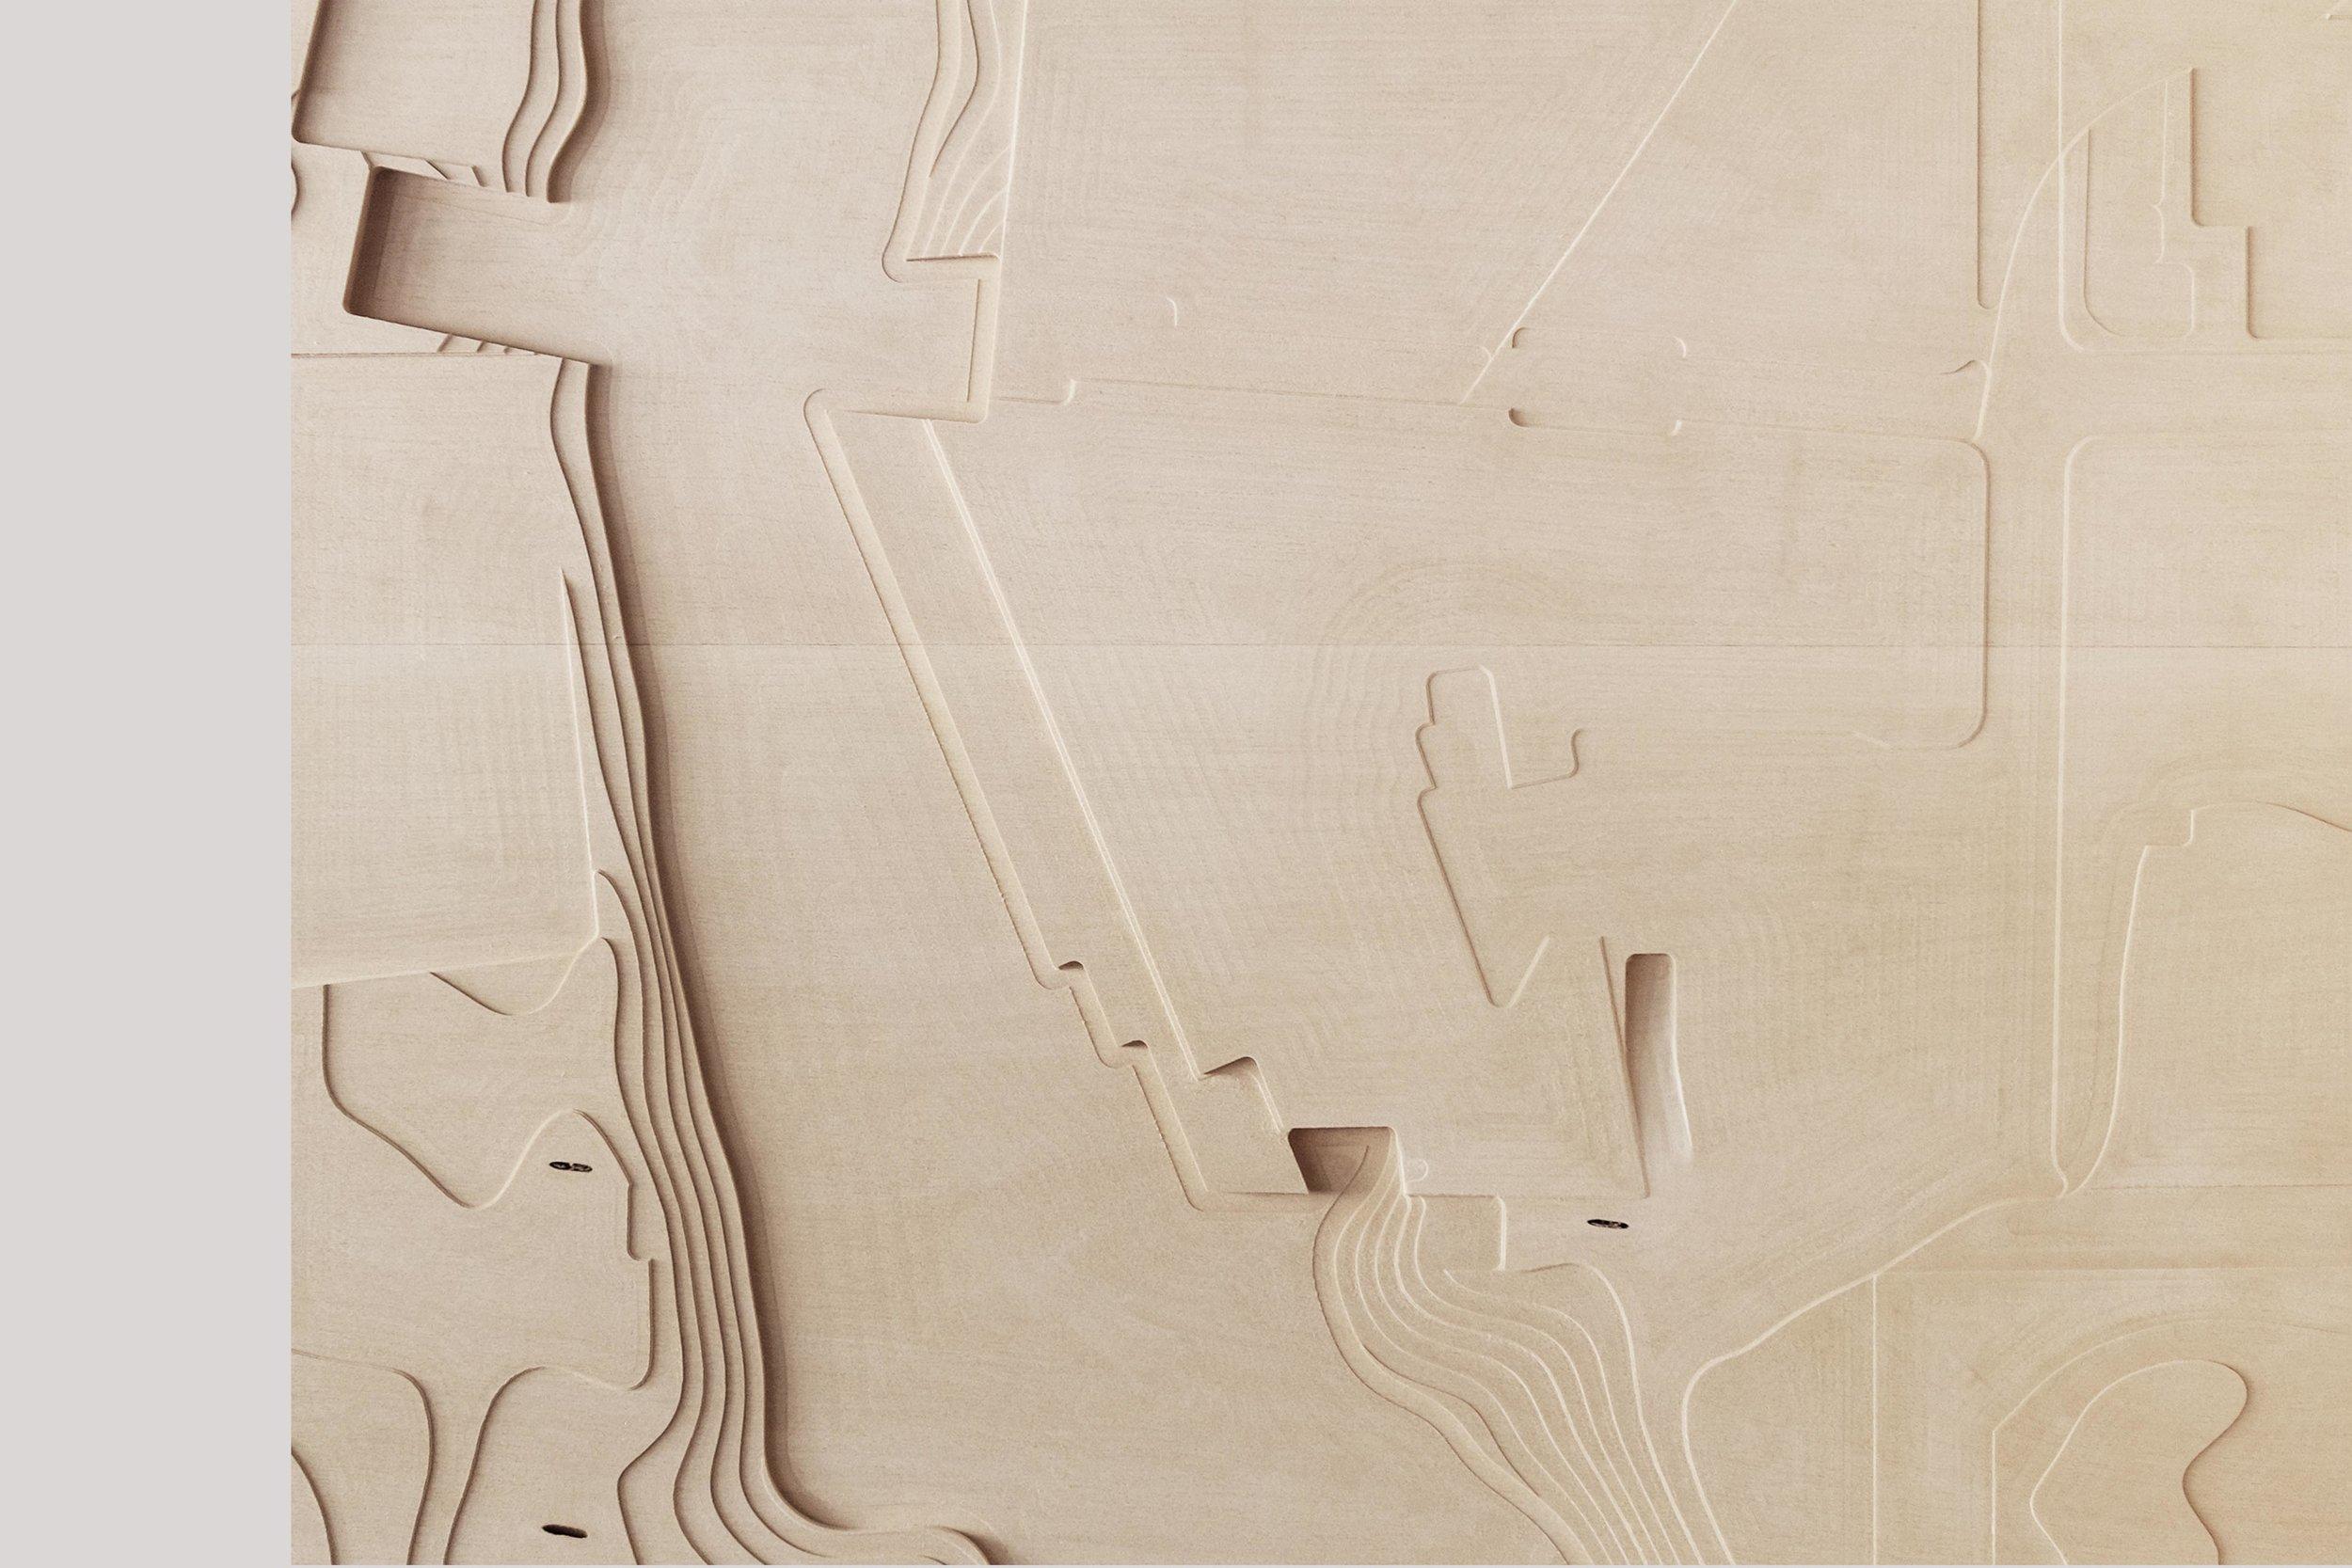 make_models_cnc_fabrication_timber_milling.jpg